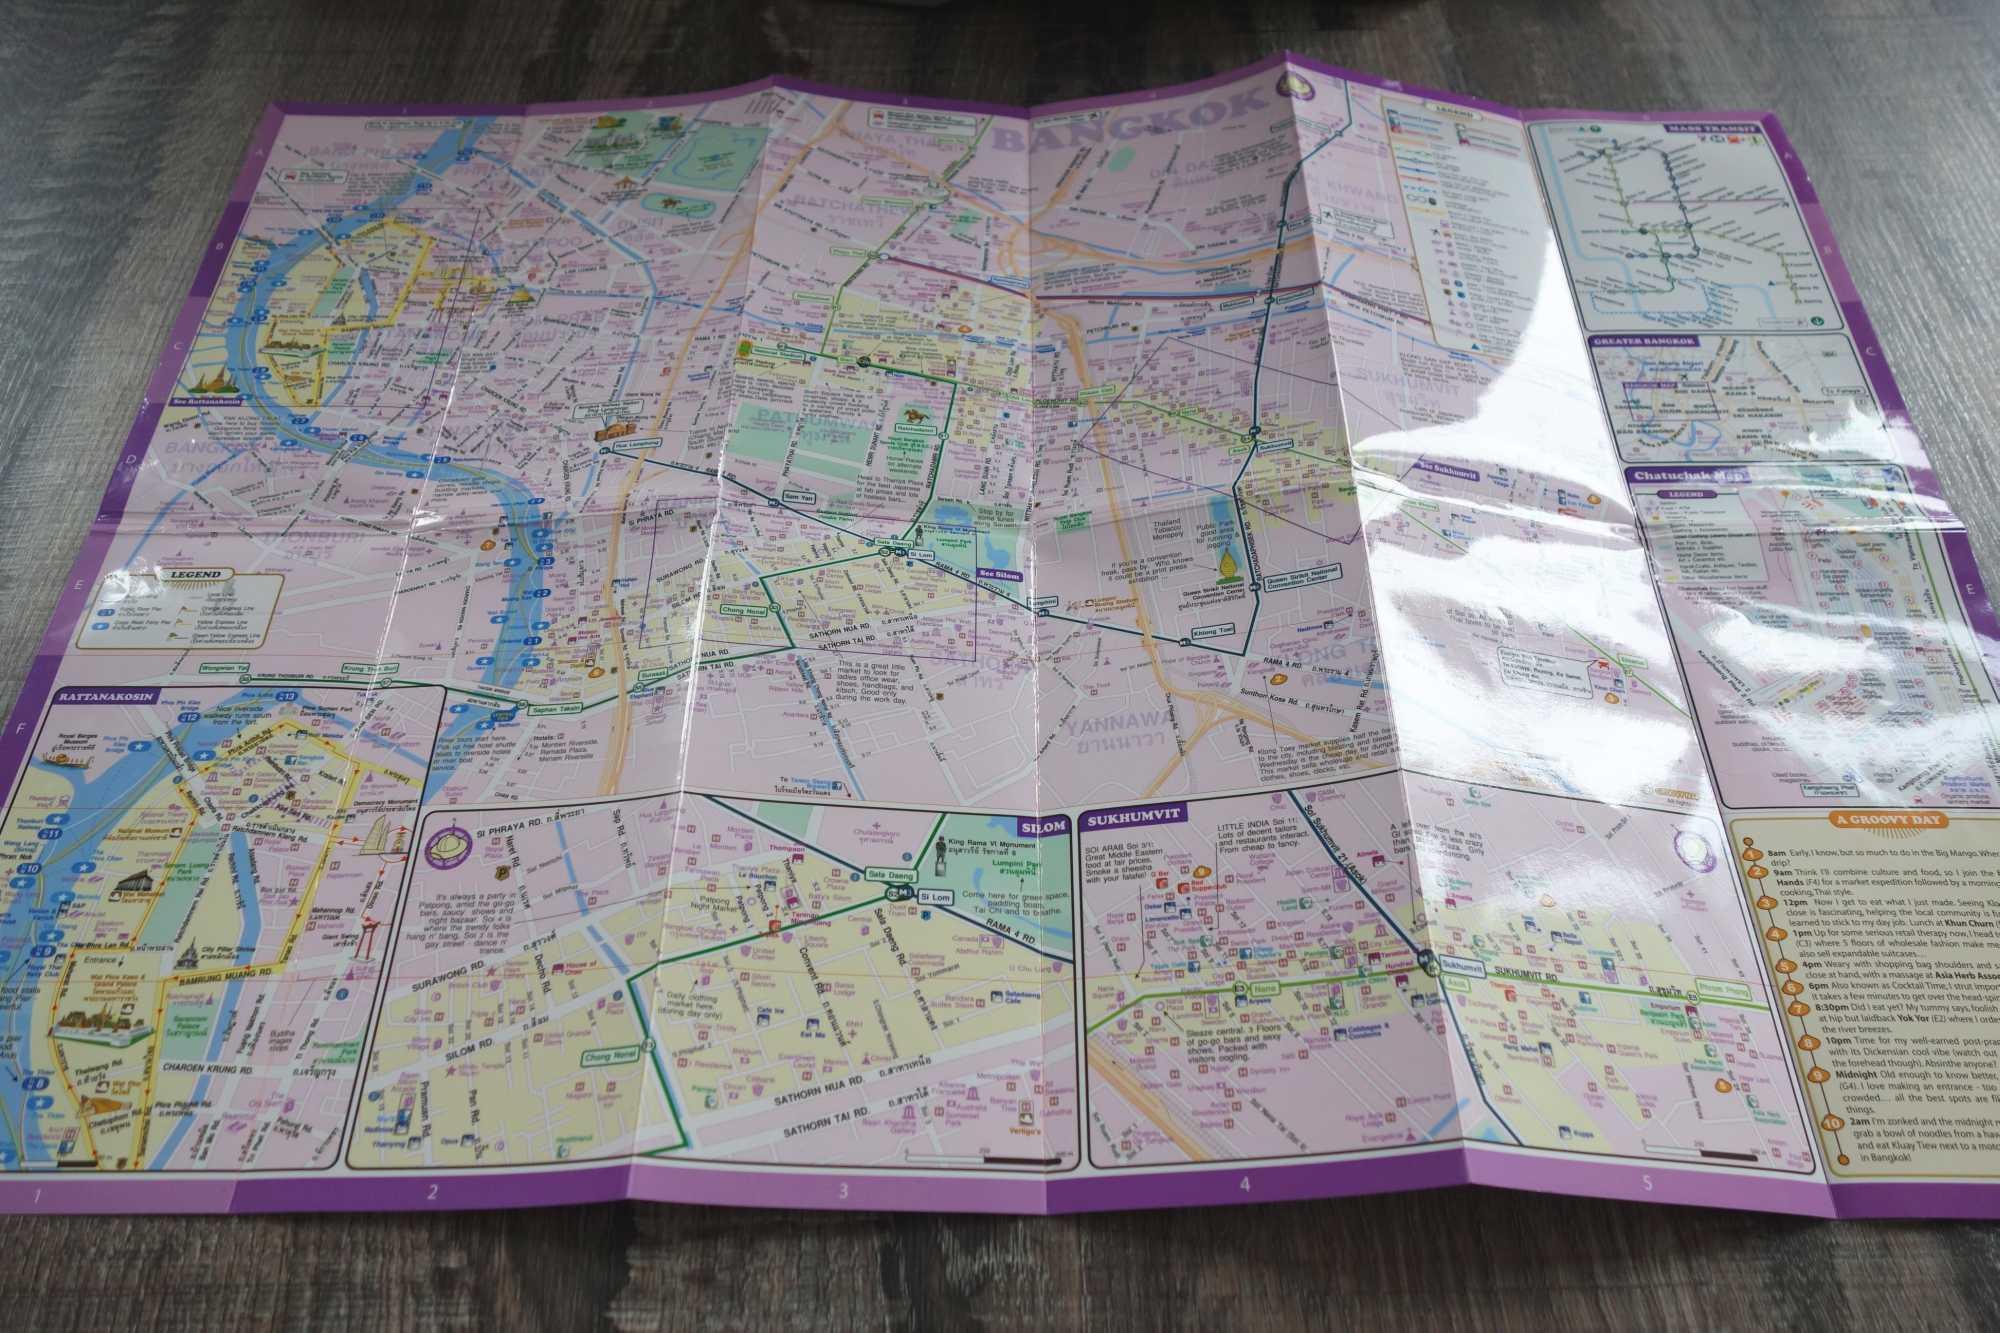 groovy map groovy map tutorial grails cookbook wb groovy map  - stadtplan karte von bangkok mit sehenswürdigkeiten bangkok stadtplan groovymaps